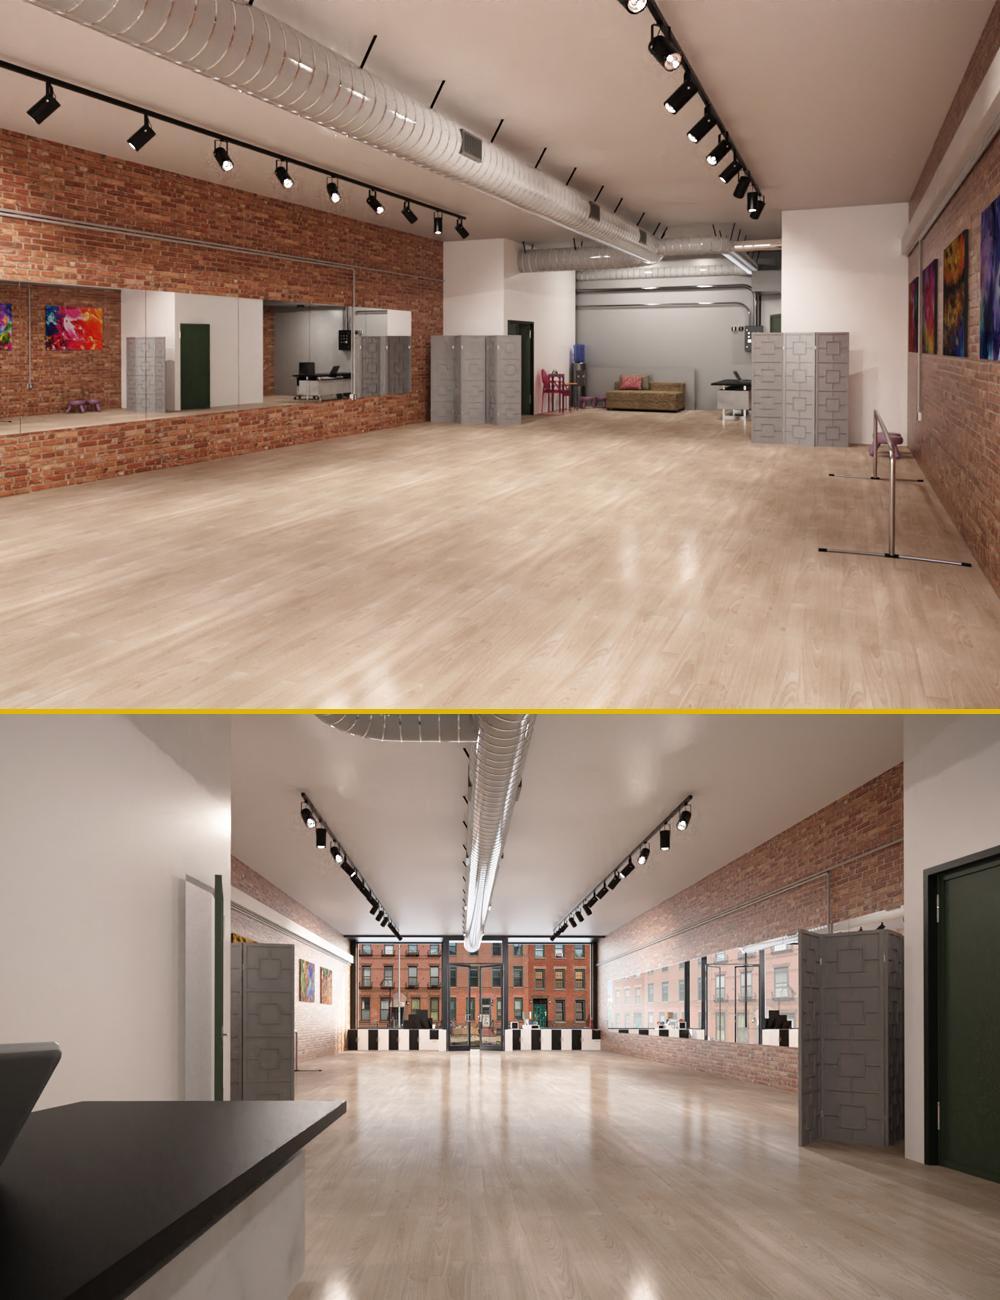 PX Dance Studio by: PerspectX, 3D Models by Daz 3D